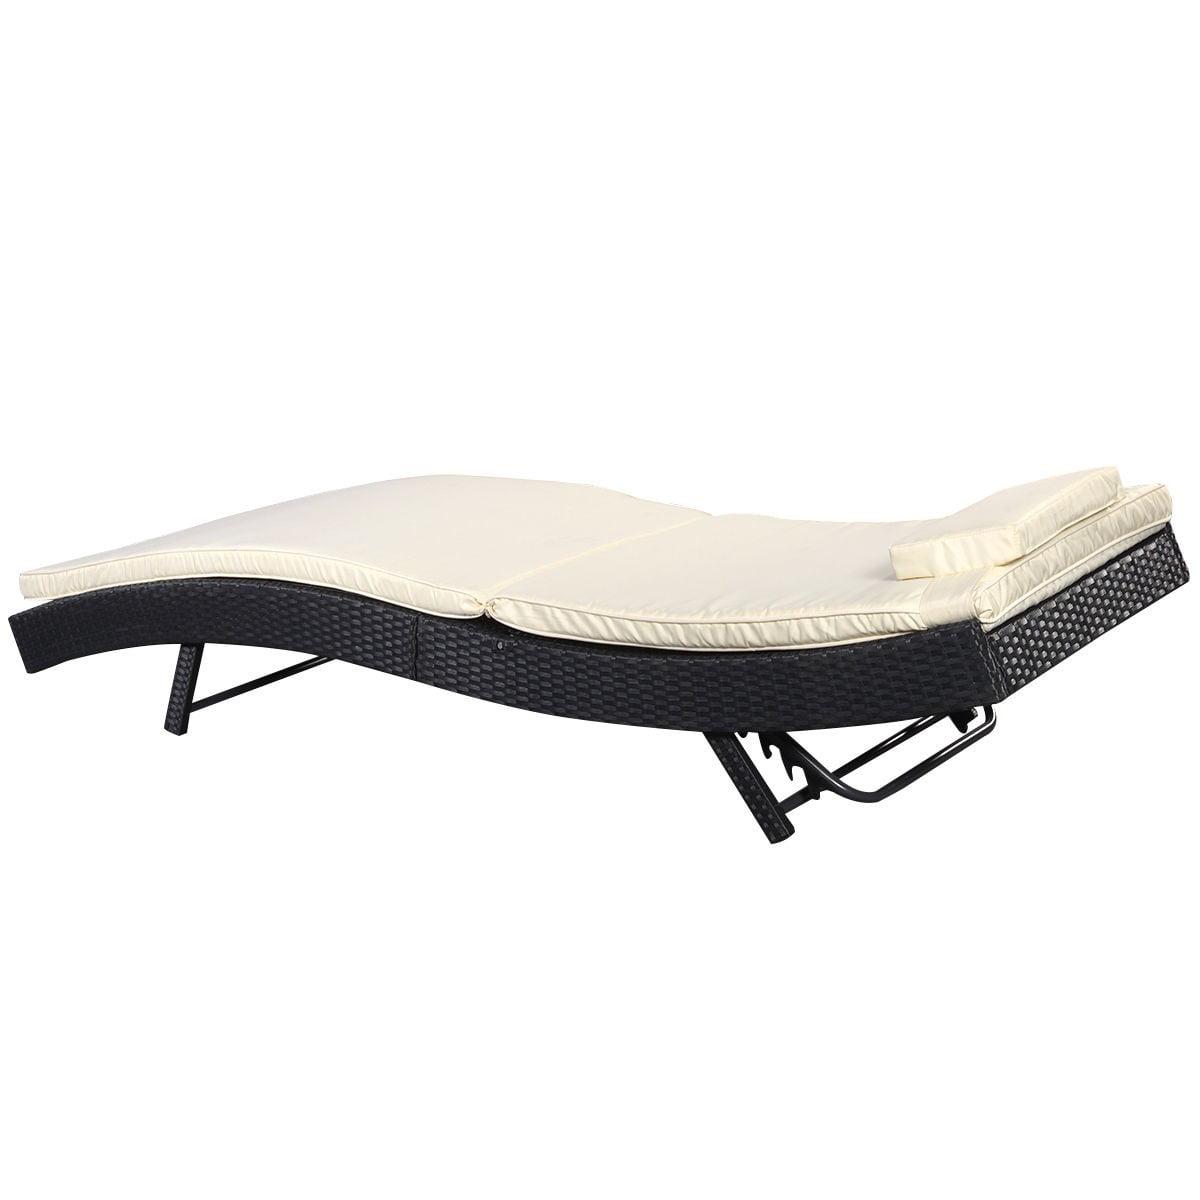 Outdoor pool chaise lounge chair pe wicker patio furniture adjustable - Outdoor Pool Chaise Lounge Chair Pe Wicker Patio Furniture Adjustable New Walmart Com